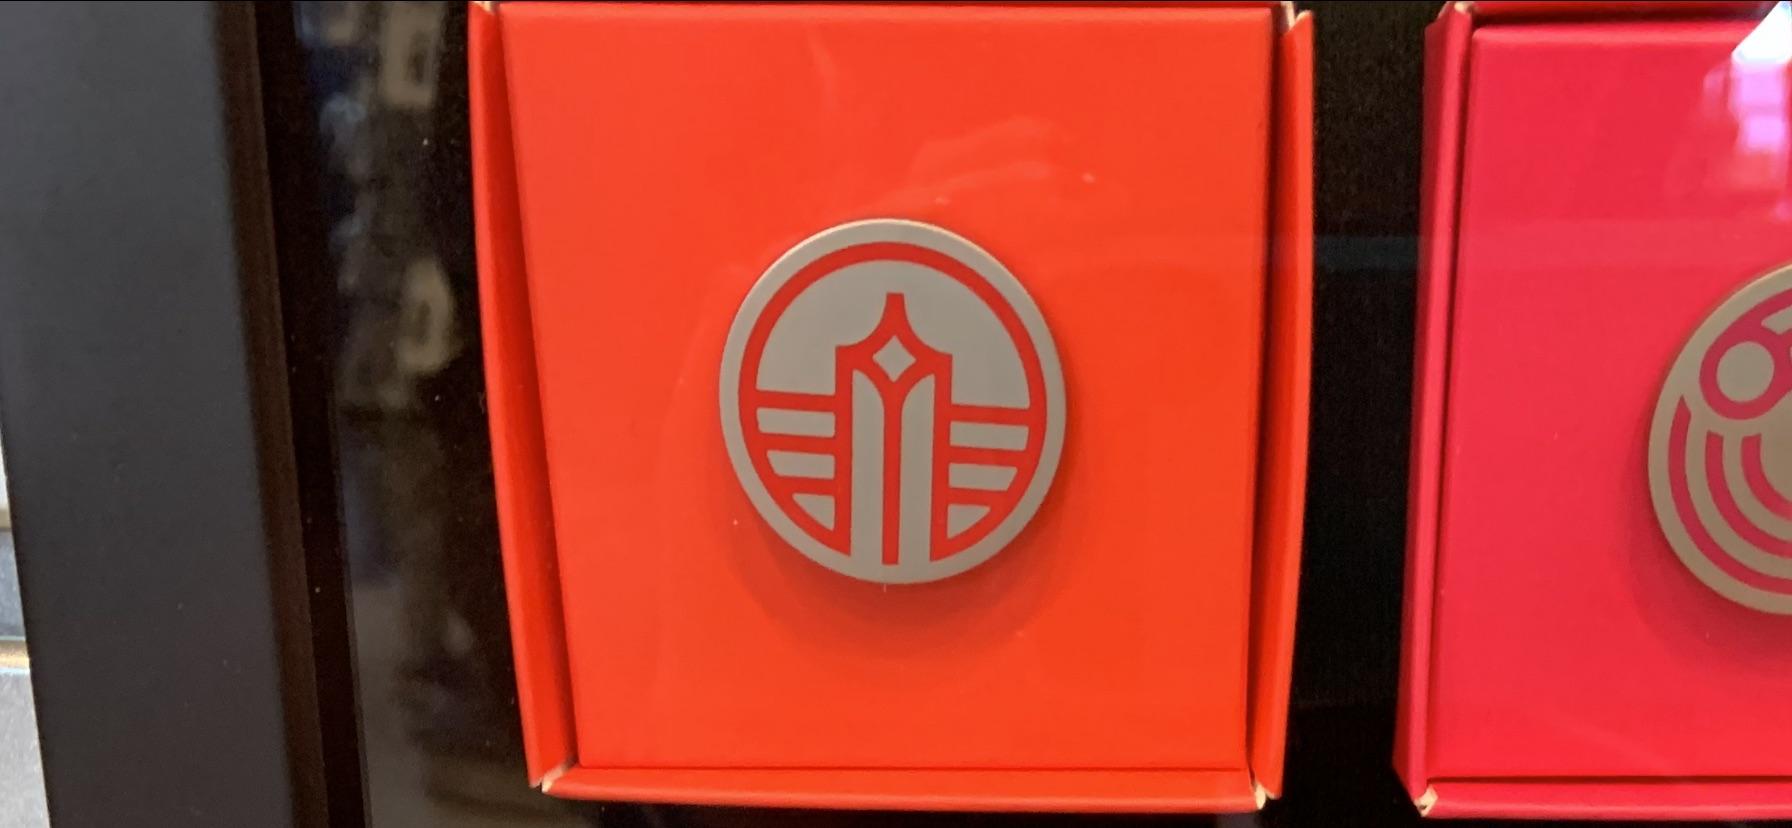 EPCOT pavilion logo pins 12/23/19 22